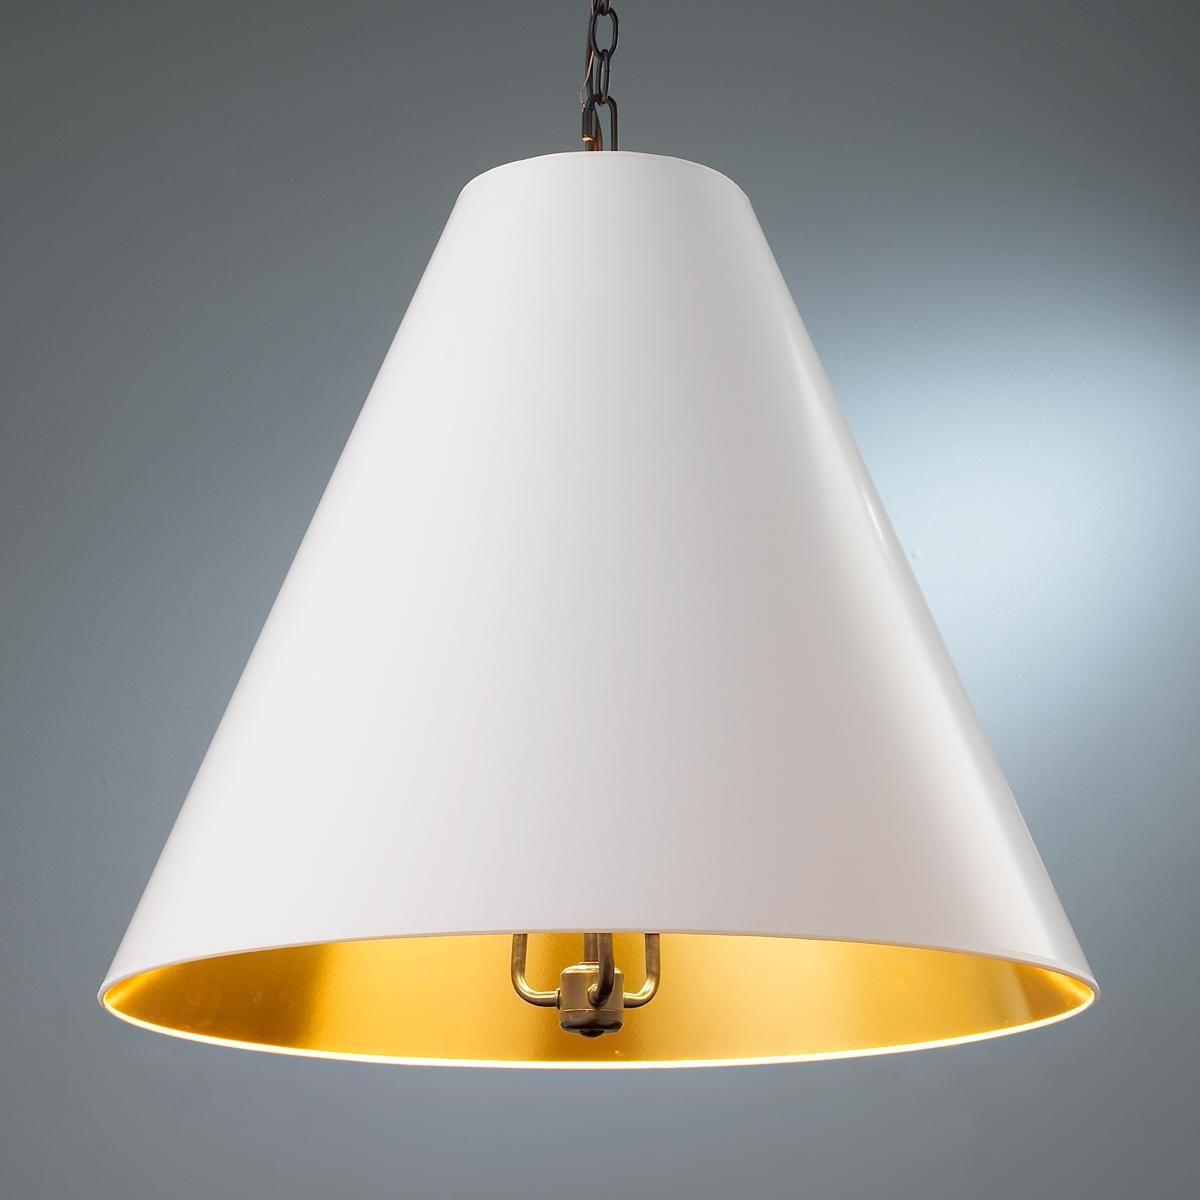 Oversized Cone Paper Shade Pendant Lighting Light